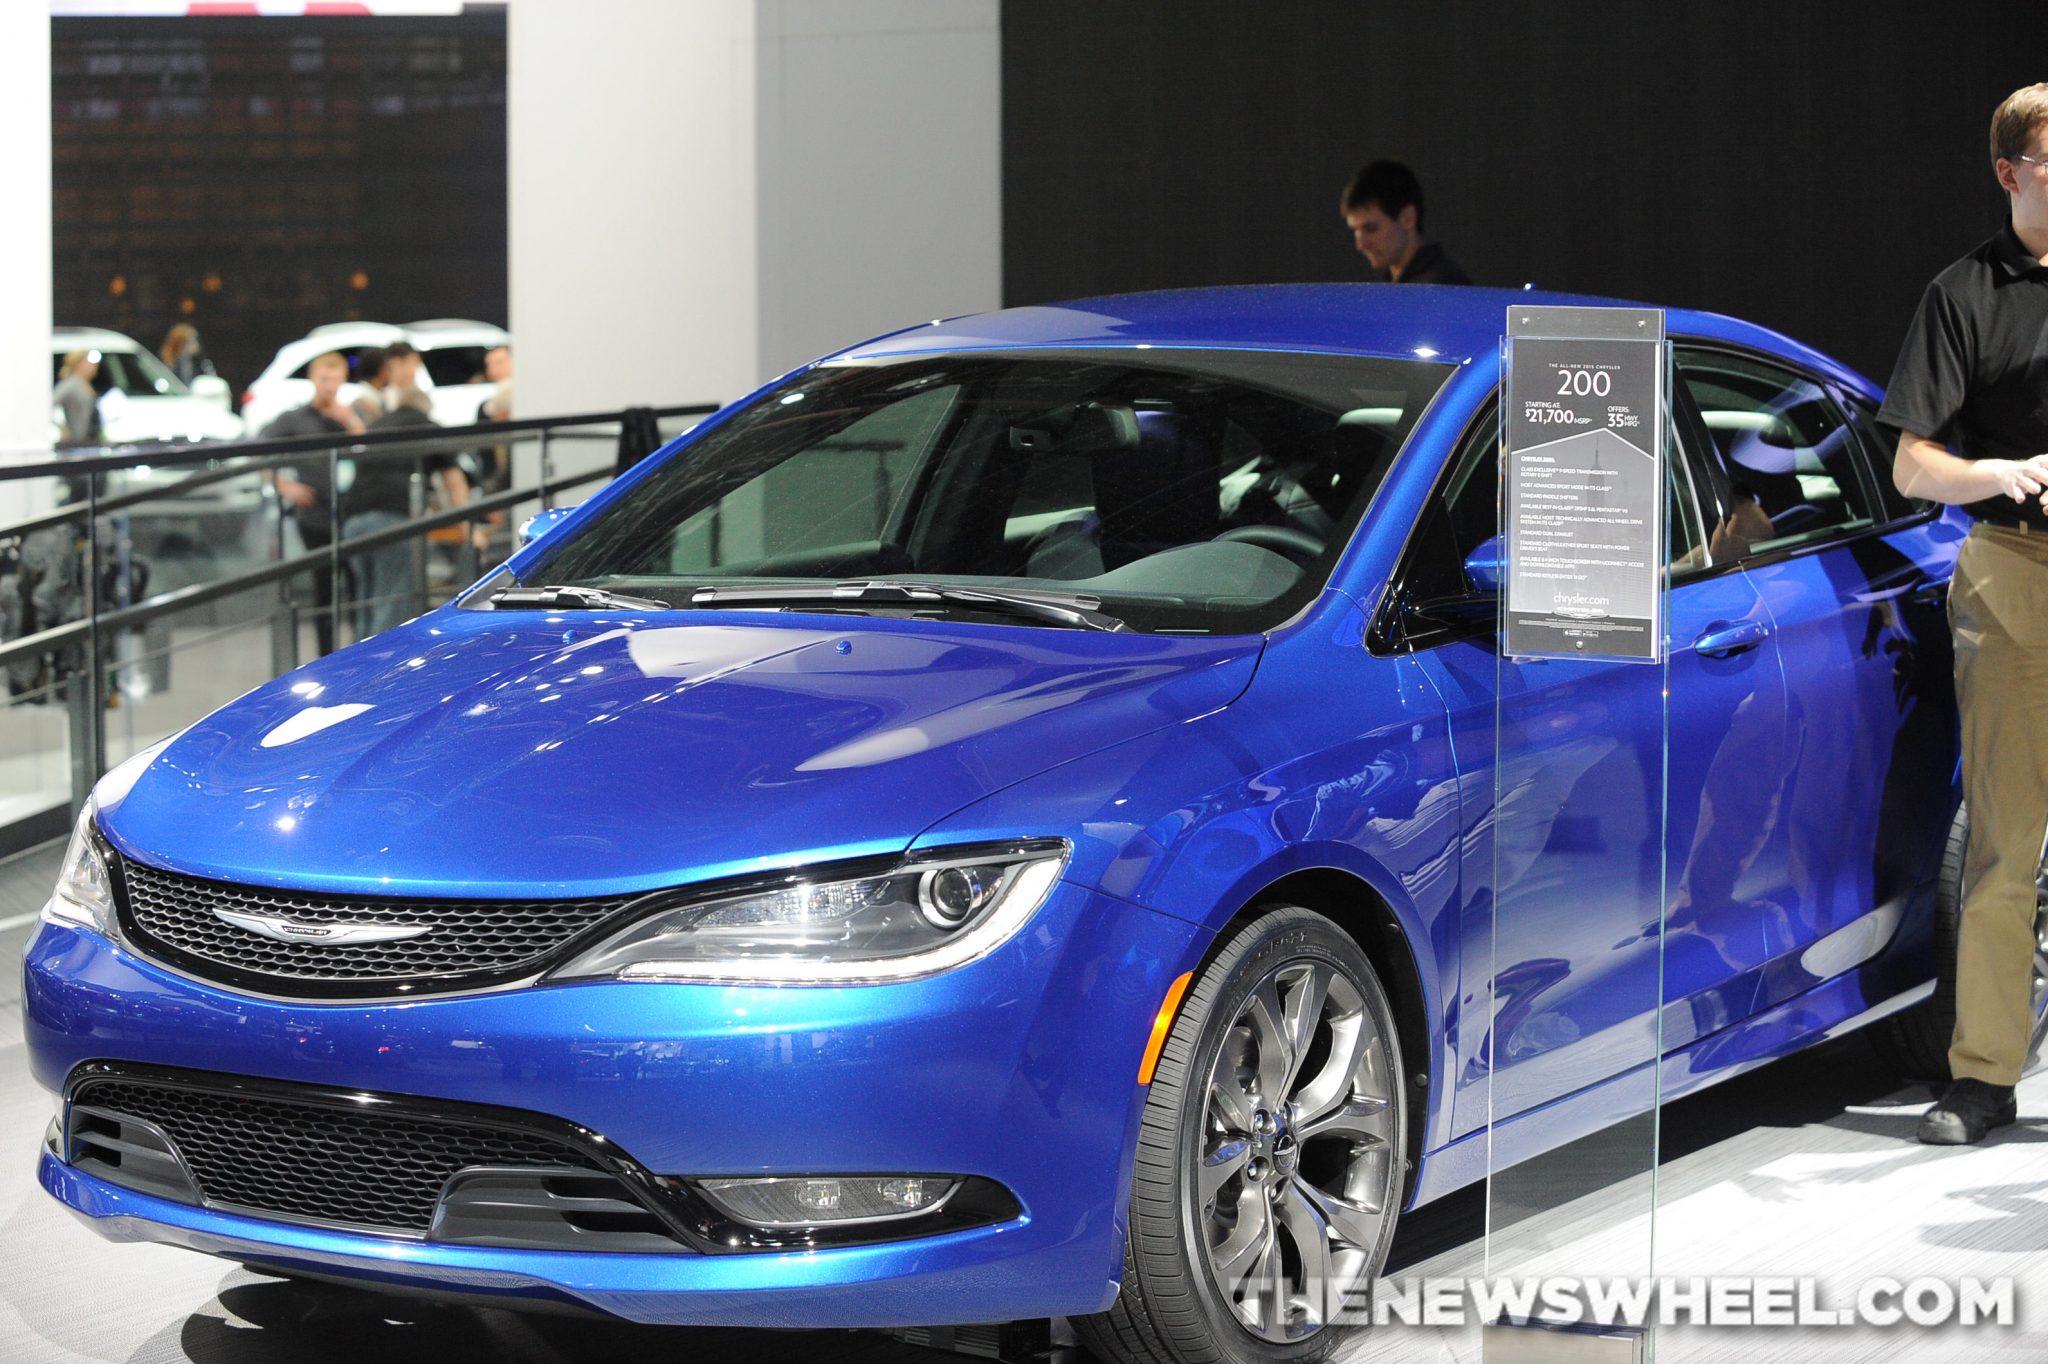 Chrysler NAIAS Display: 200 sedan